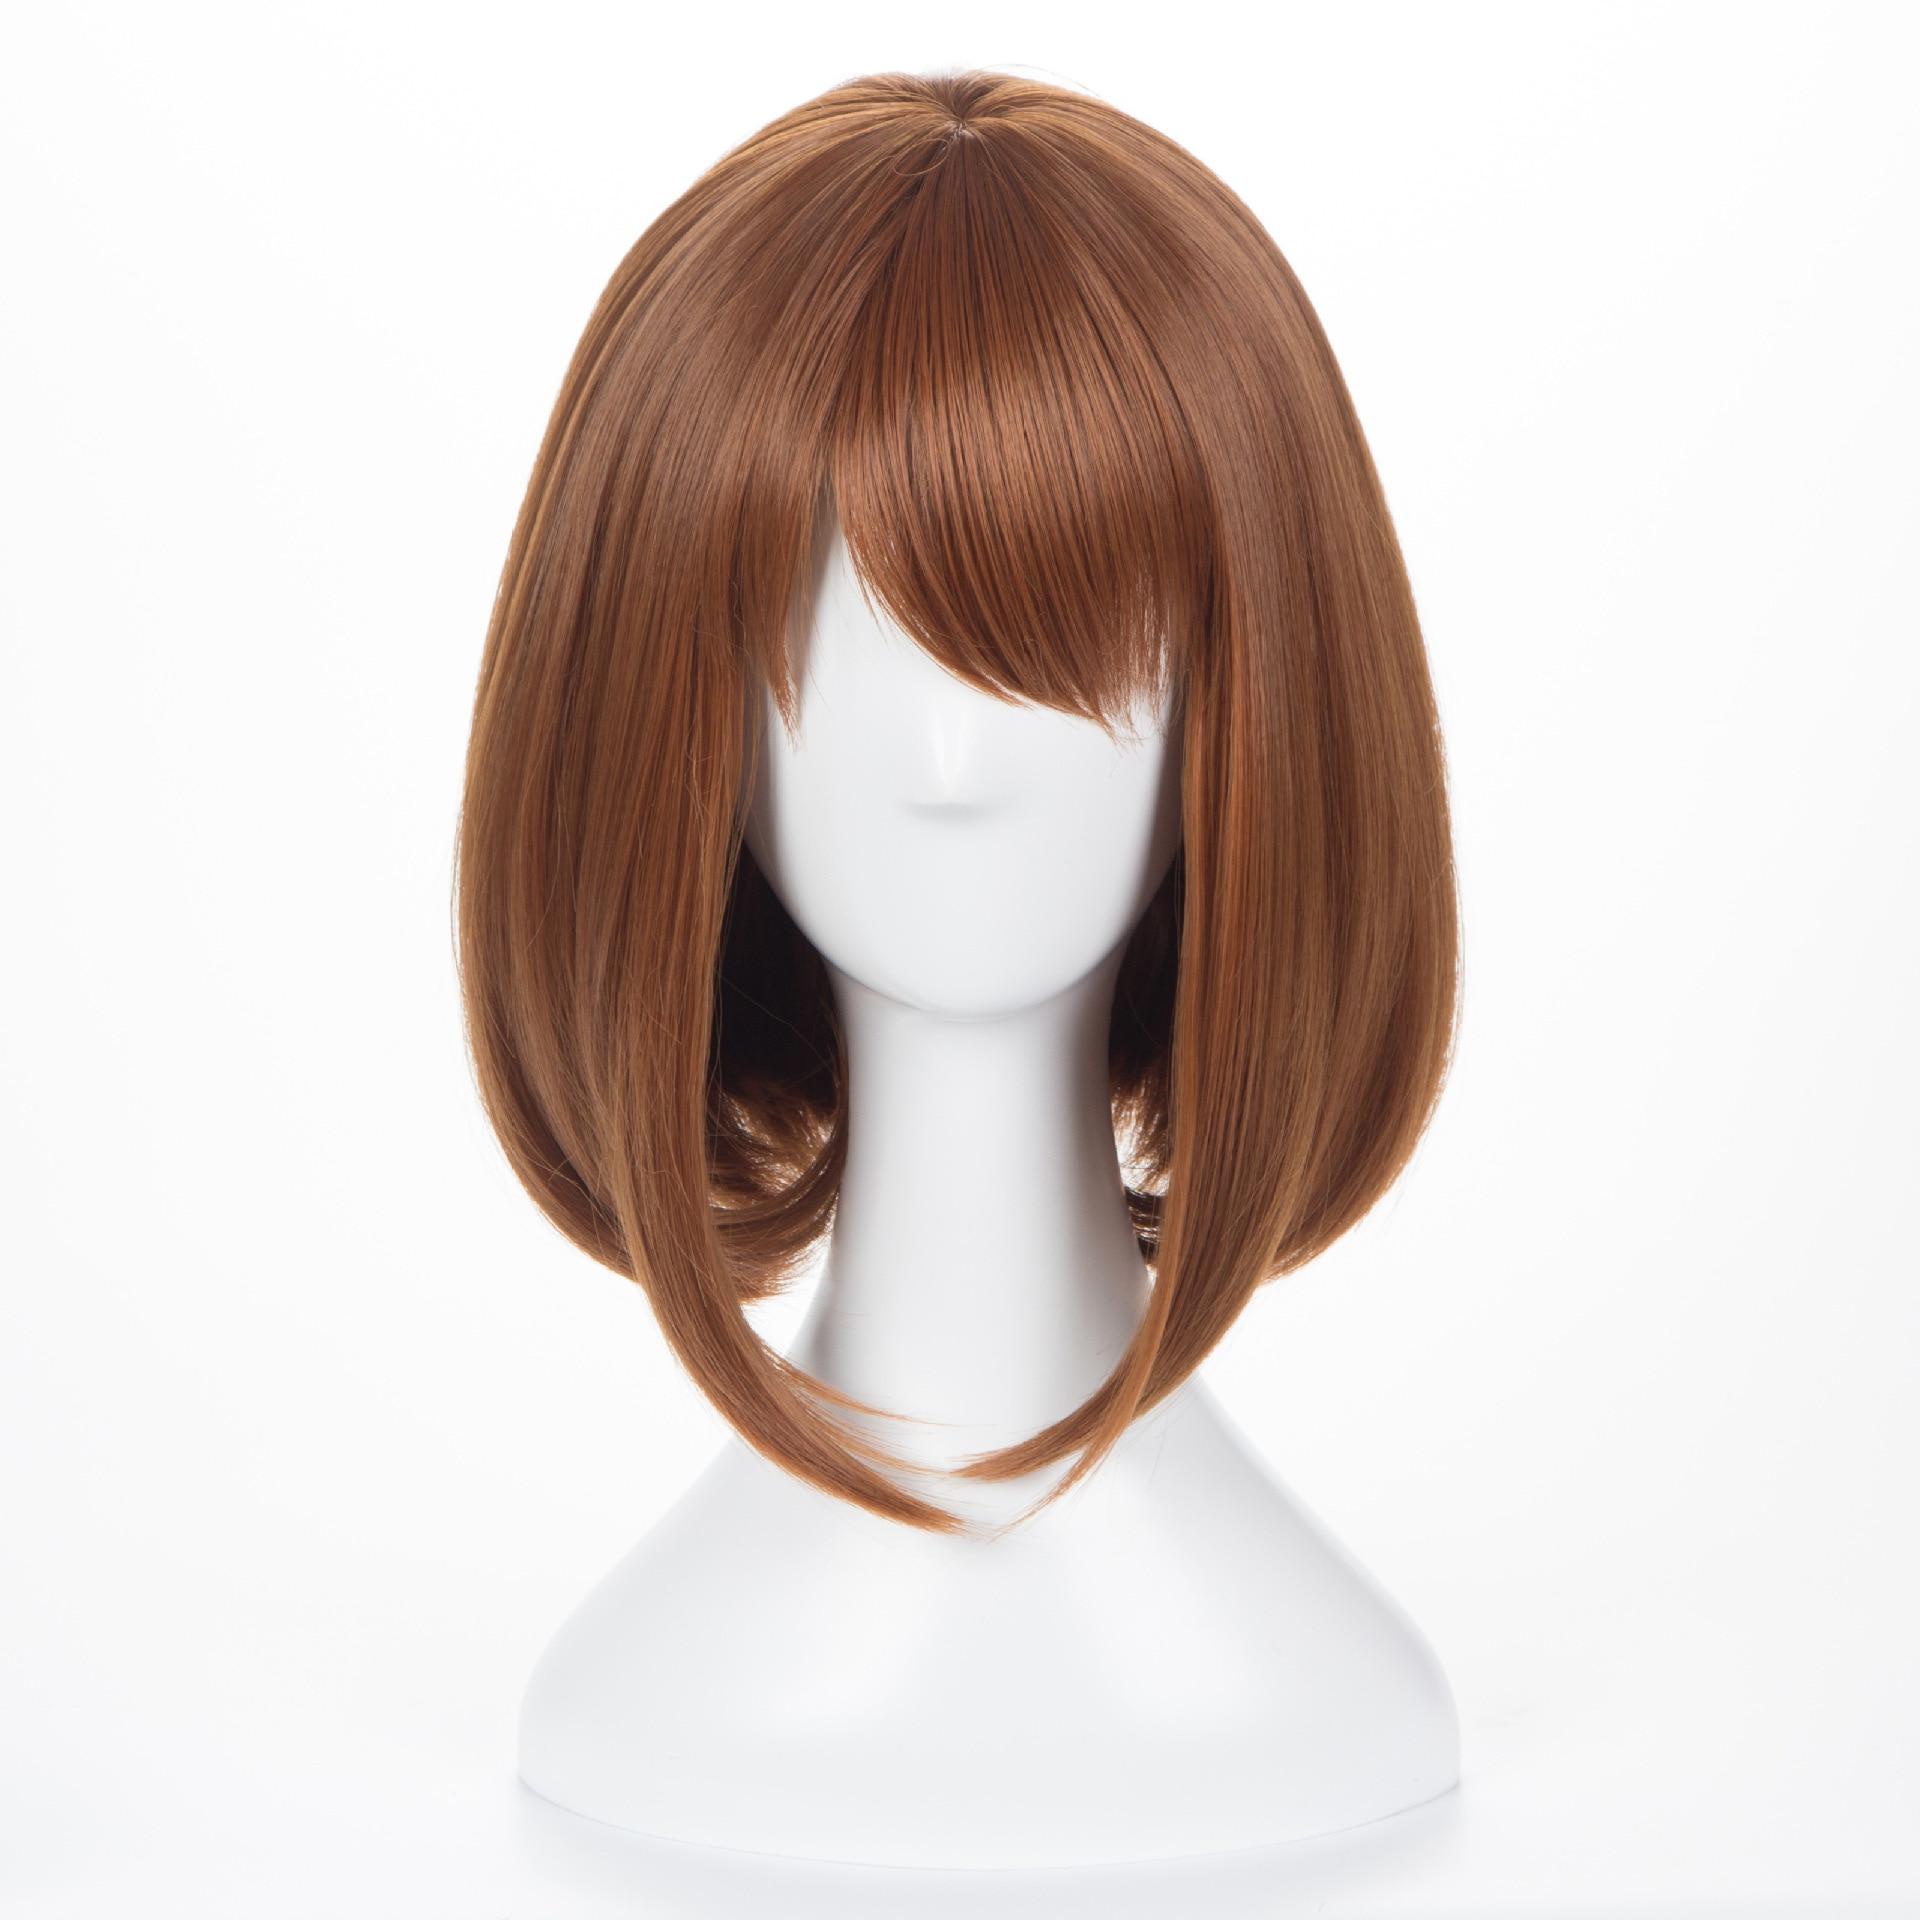 OCHACO URARAKA Wig Anime My Boku No Hero Academia OCHACO URARAKA Wig Headwear